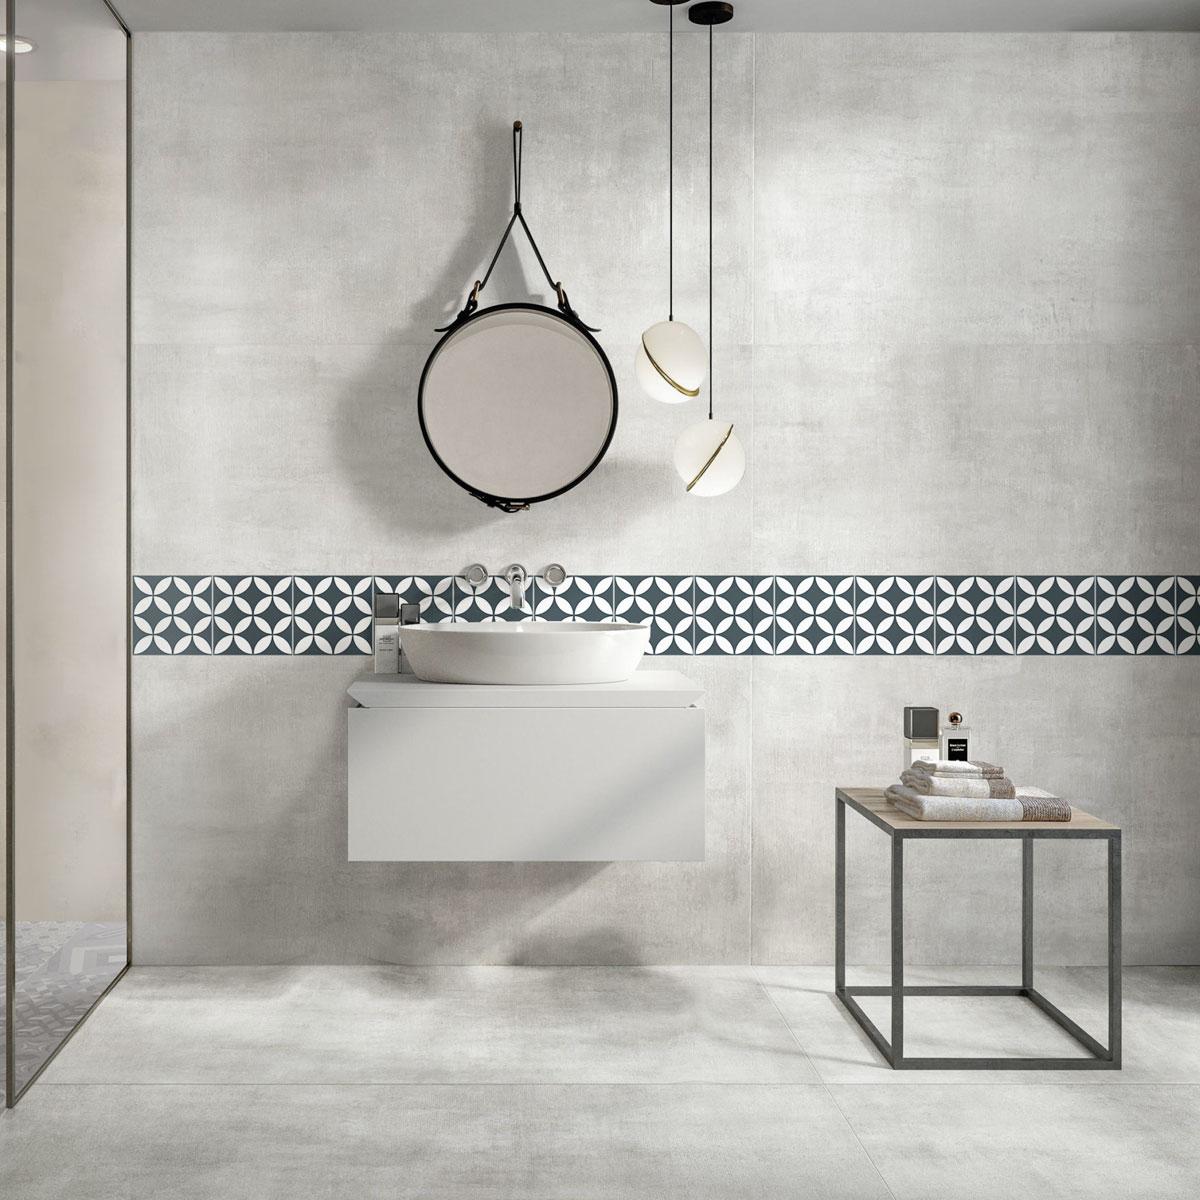 Picasso Evolution - Star Navy Blue - Patterned Tiles - Stone3 Brisbane